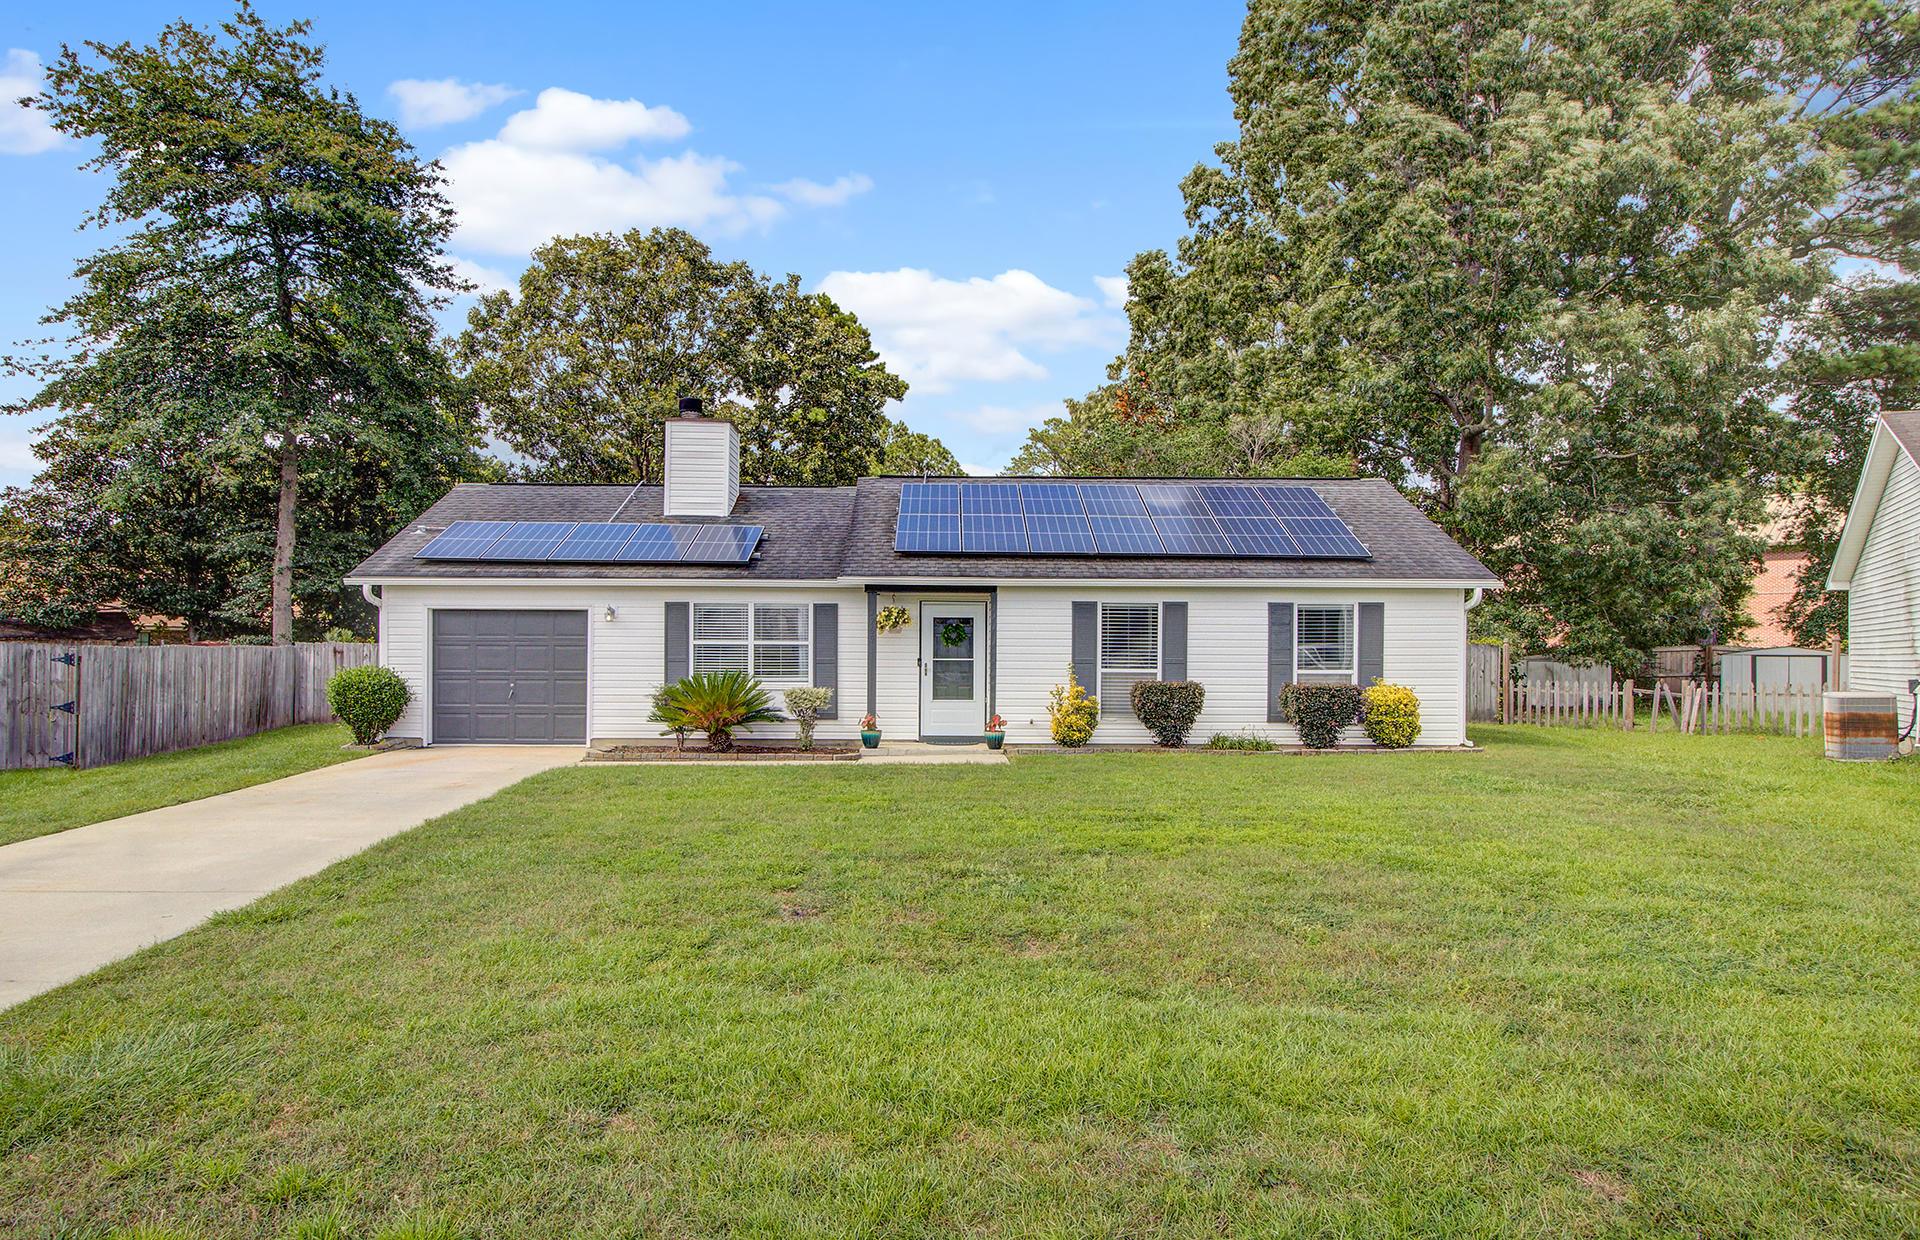 Reindeer Woods Homes For Sale - 2760 Donner, North Charleston, SC - 13